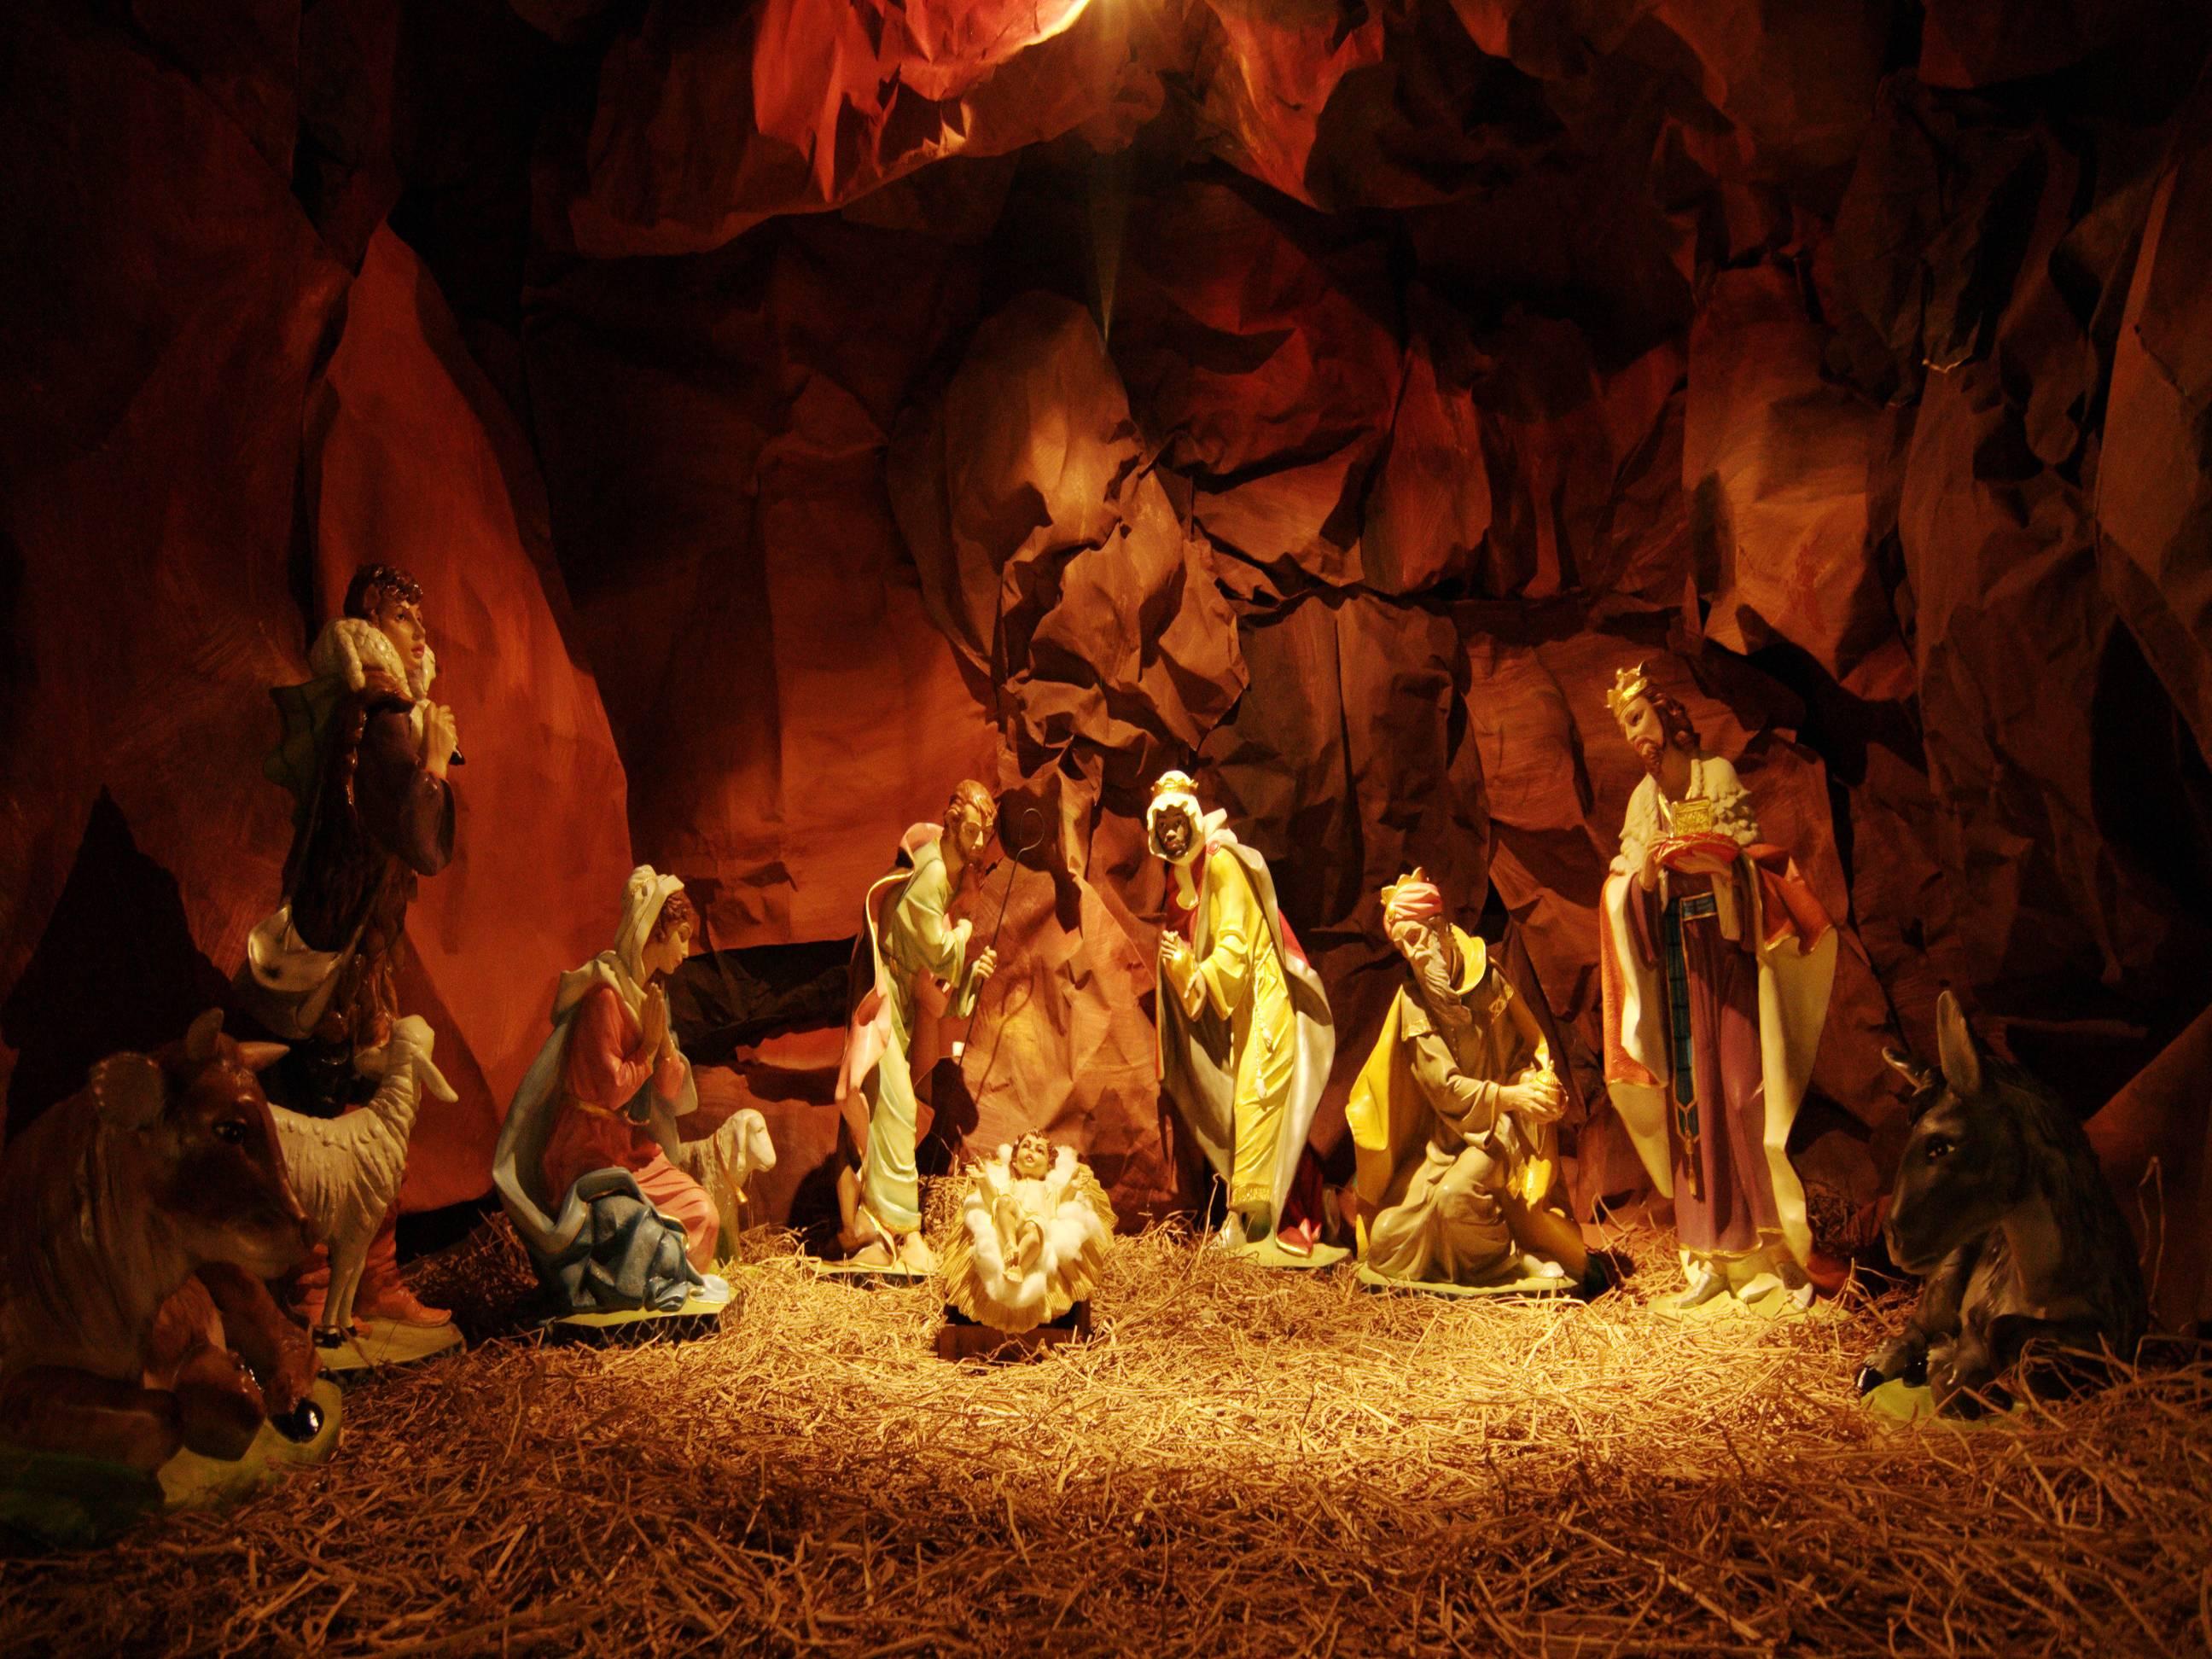 empty manger hd wallpaper - photo #24